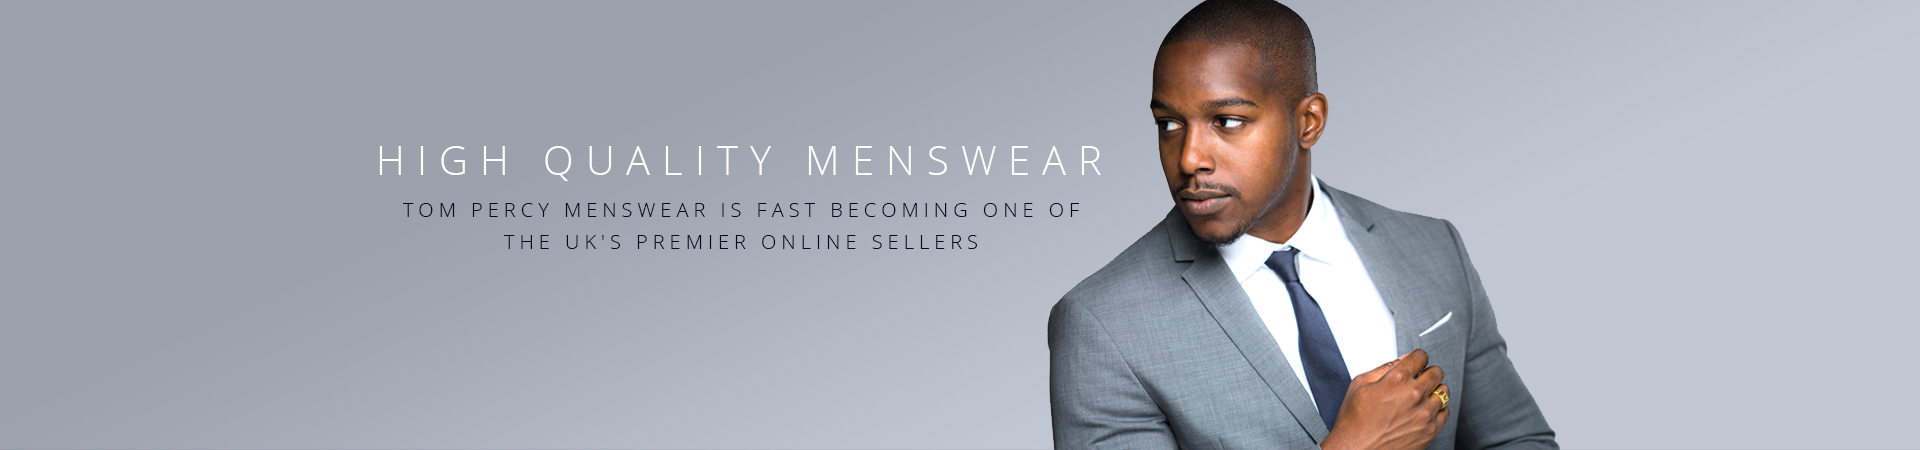 Men/'s Ben Sherman Grey Check Tailored Fit Suit 40R W34 L31 VB11